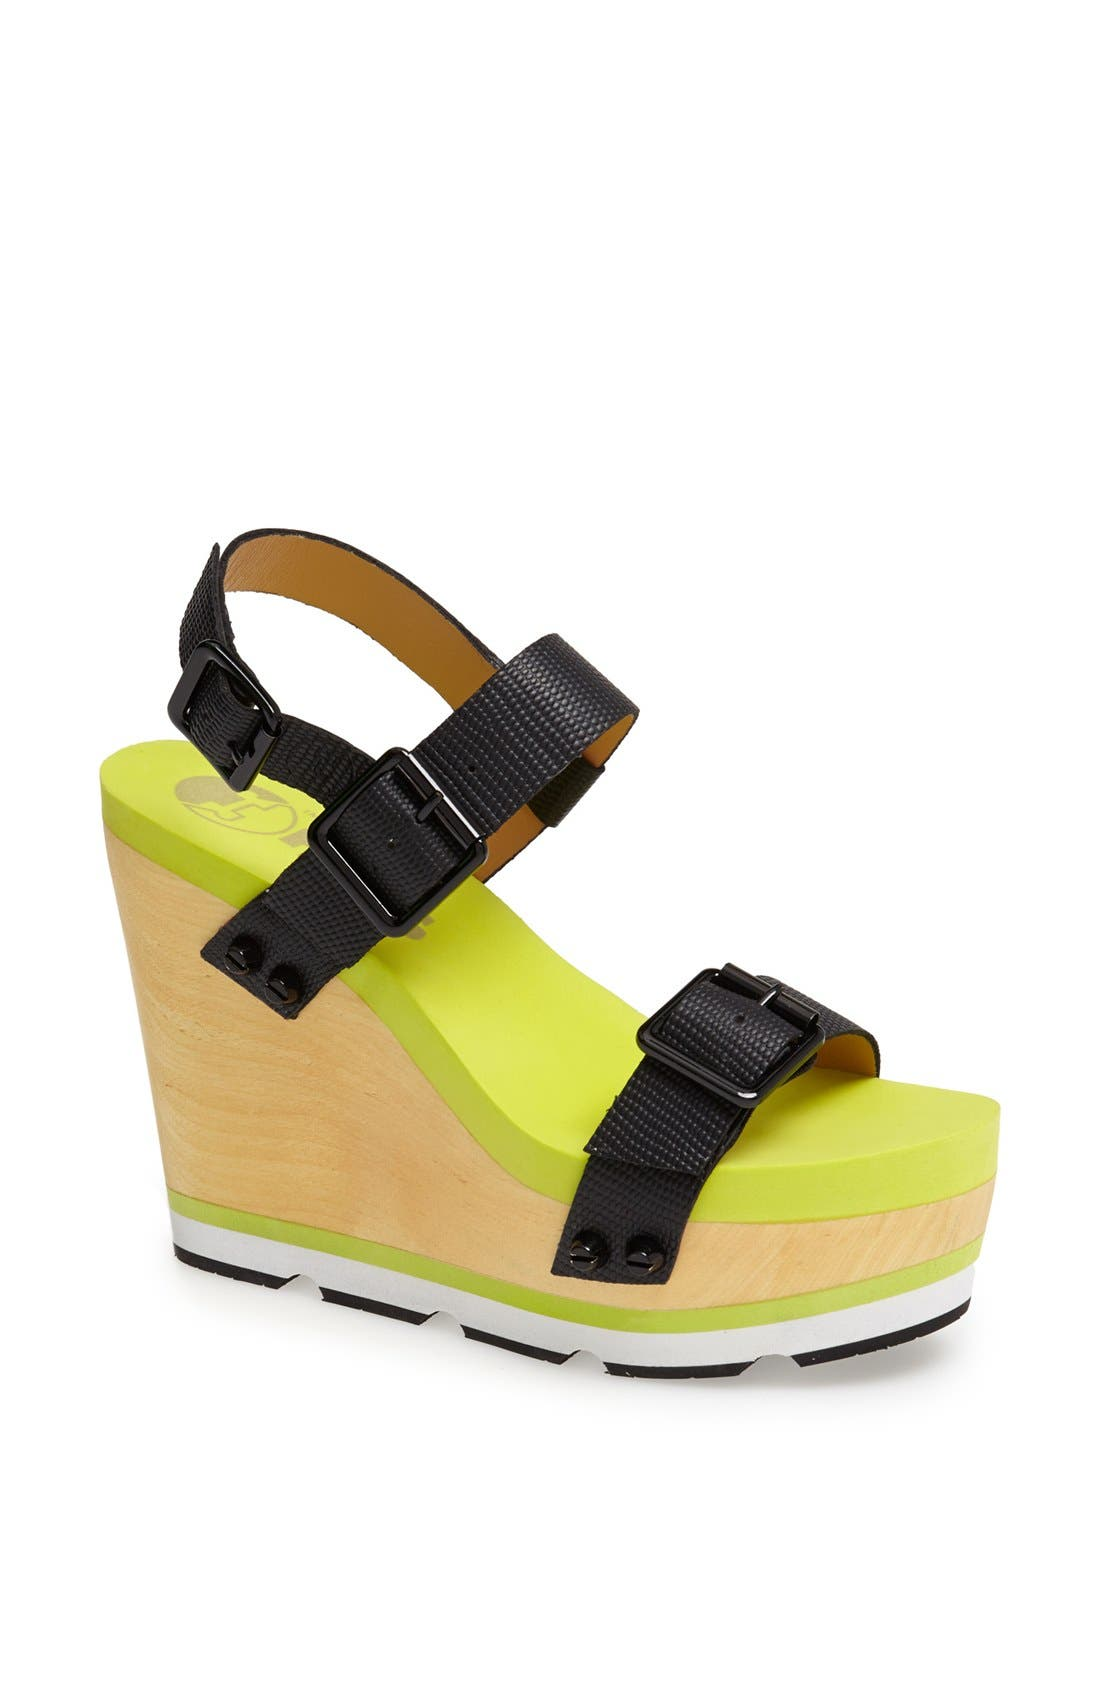 Alternate Image 1 Selected - Flogg 'Claudia' Wedge Platform Sandal